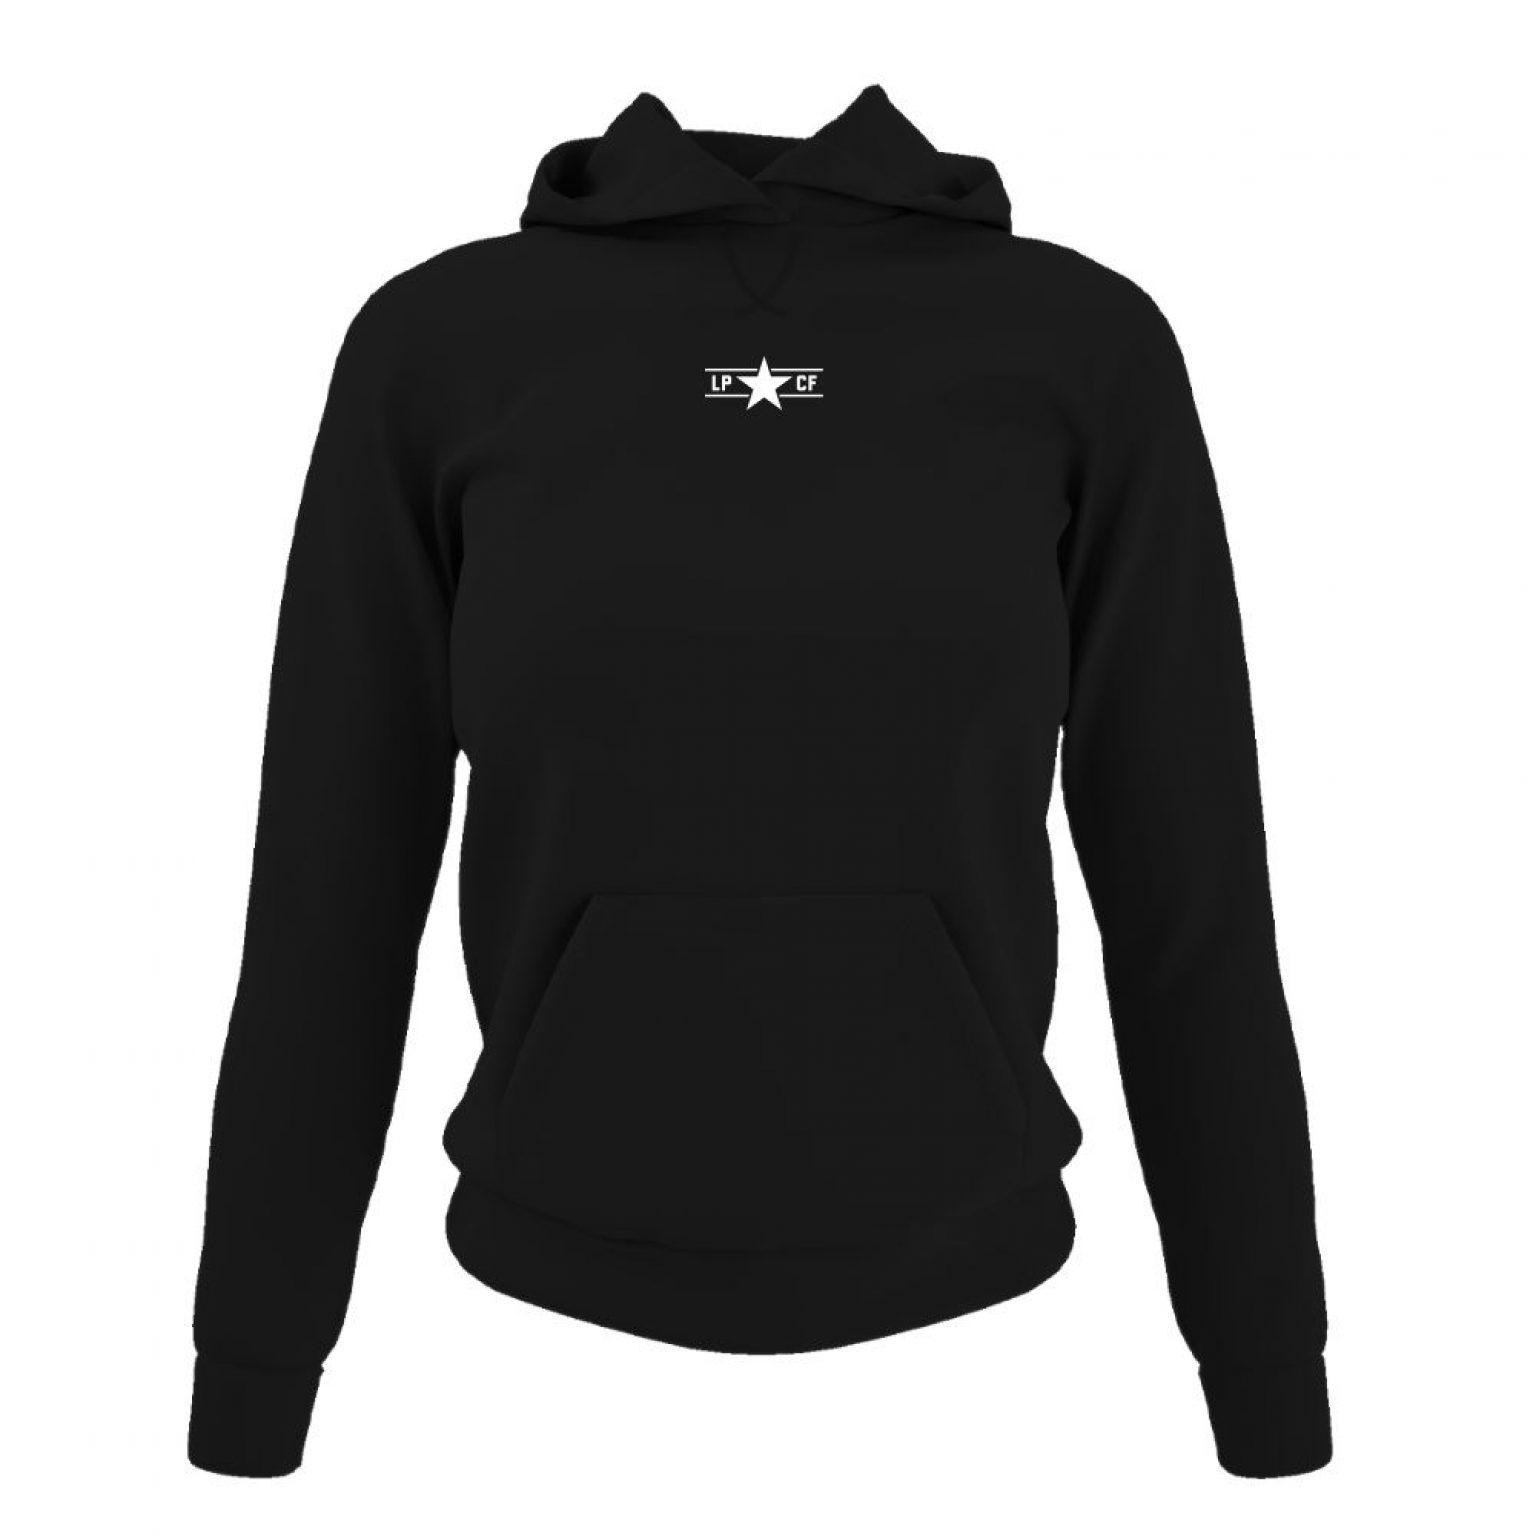 LPcircle hoodie damen black front